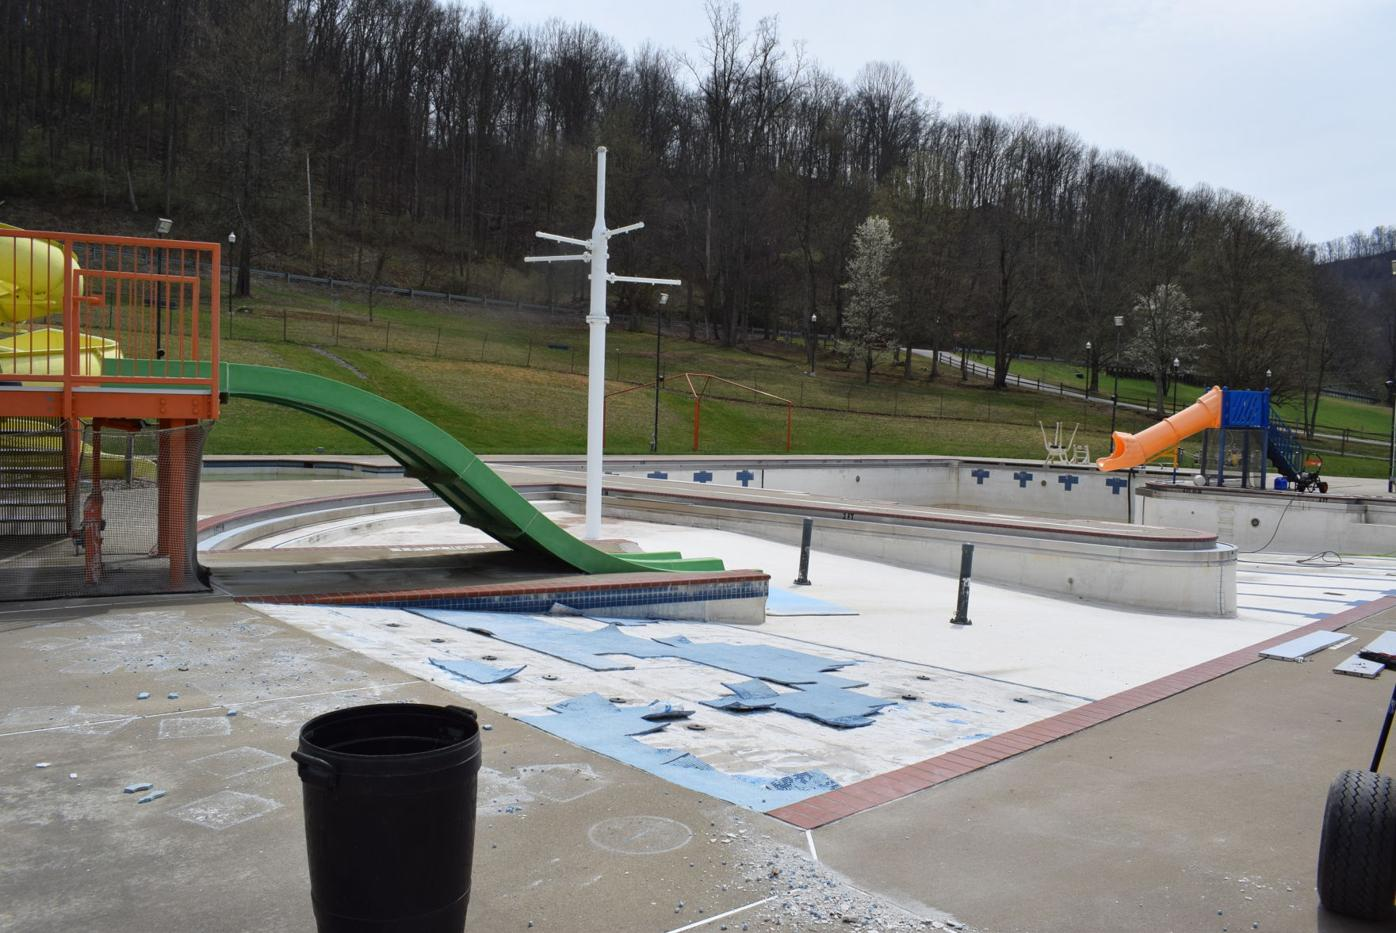 Lewis County Park preparing for summer season